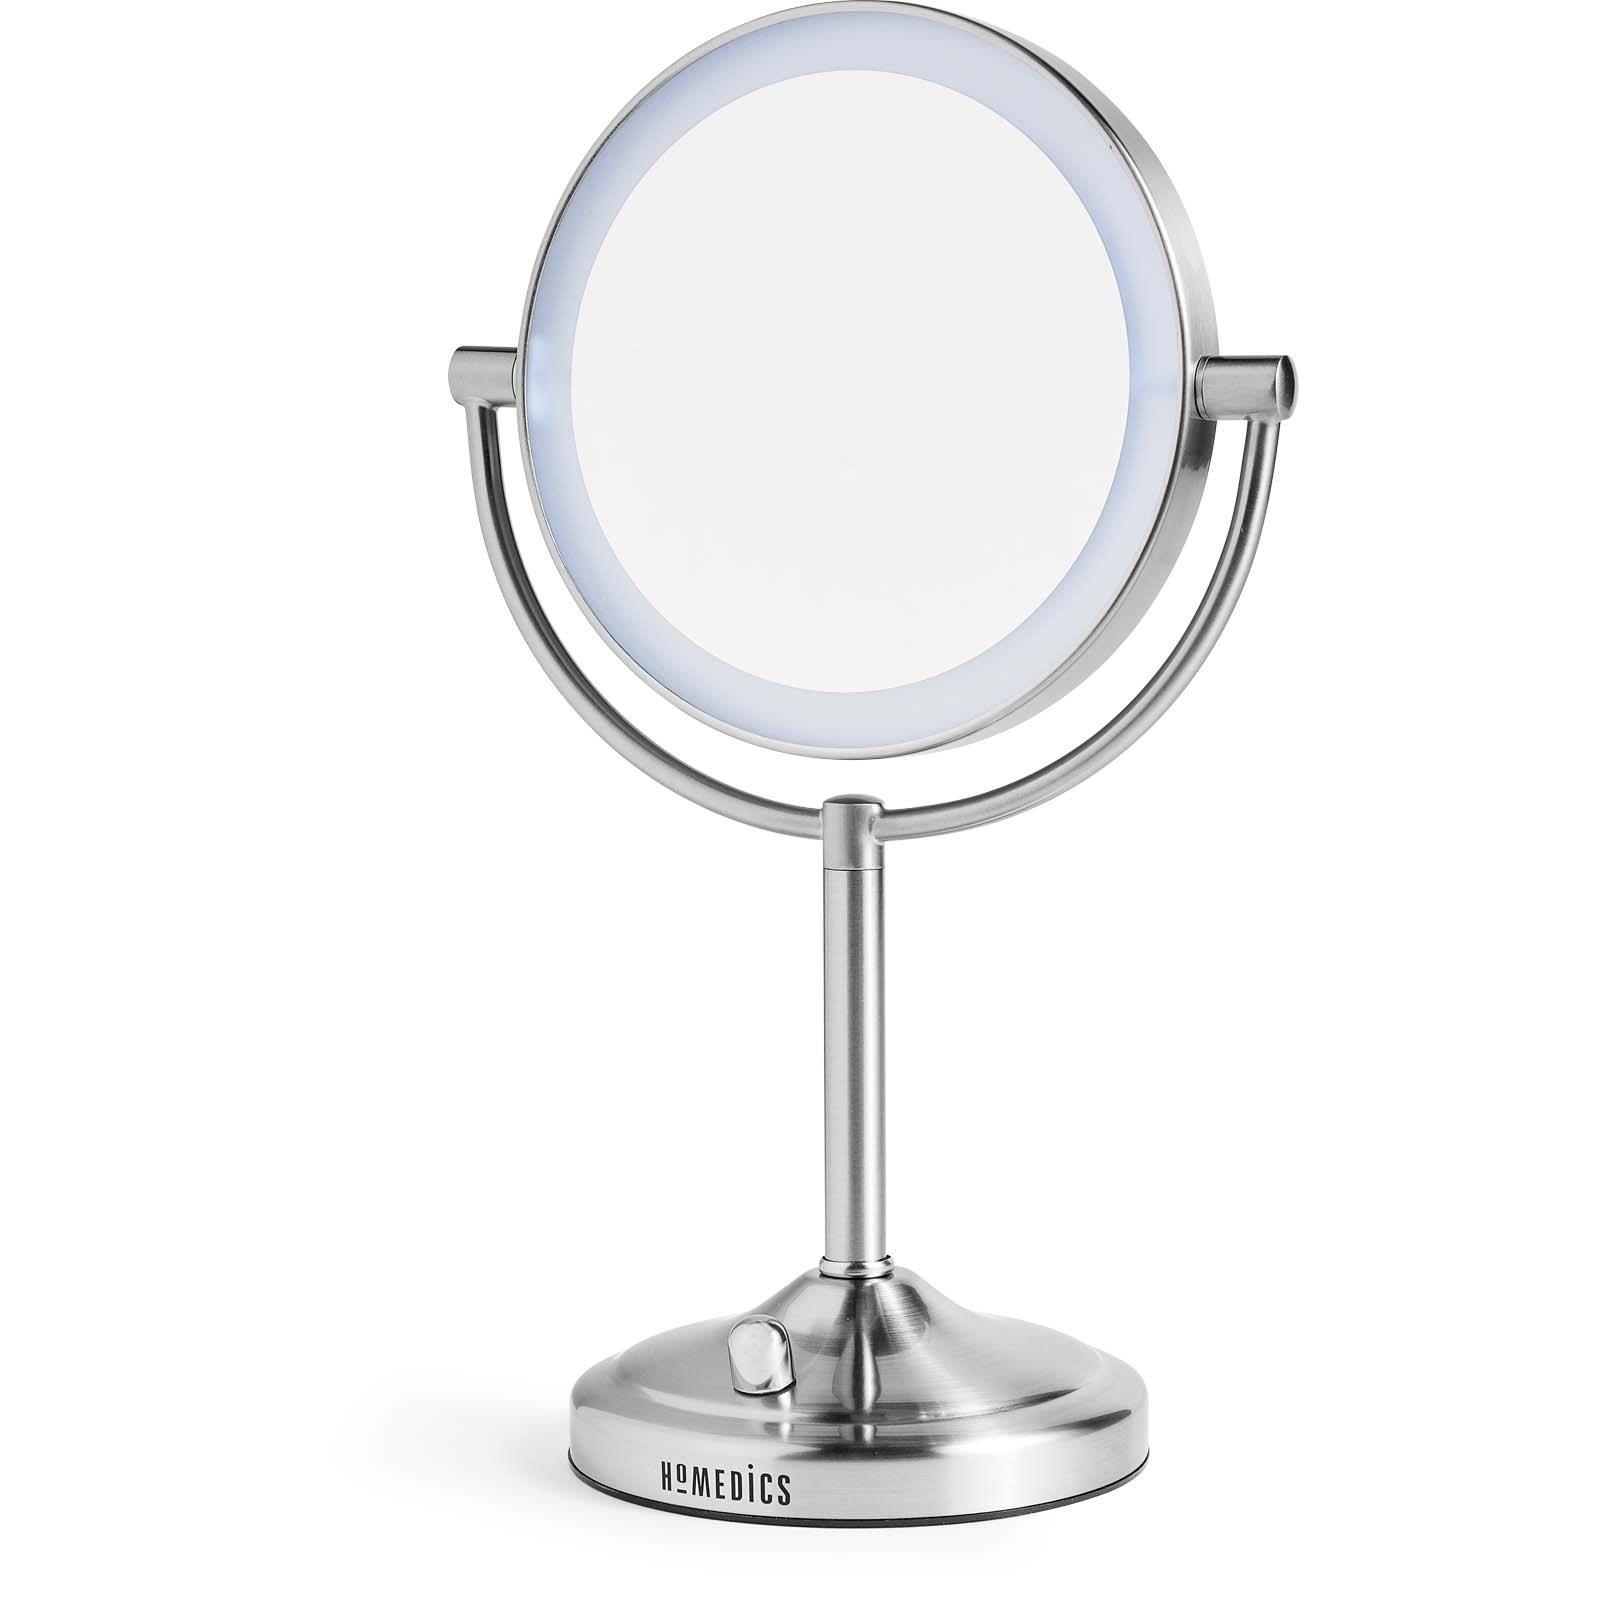 Homedics dobbeltsidet make-up spejl